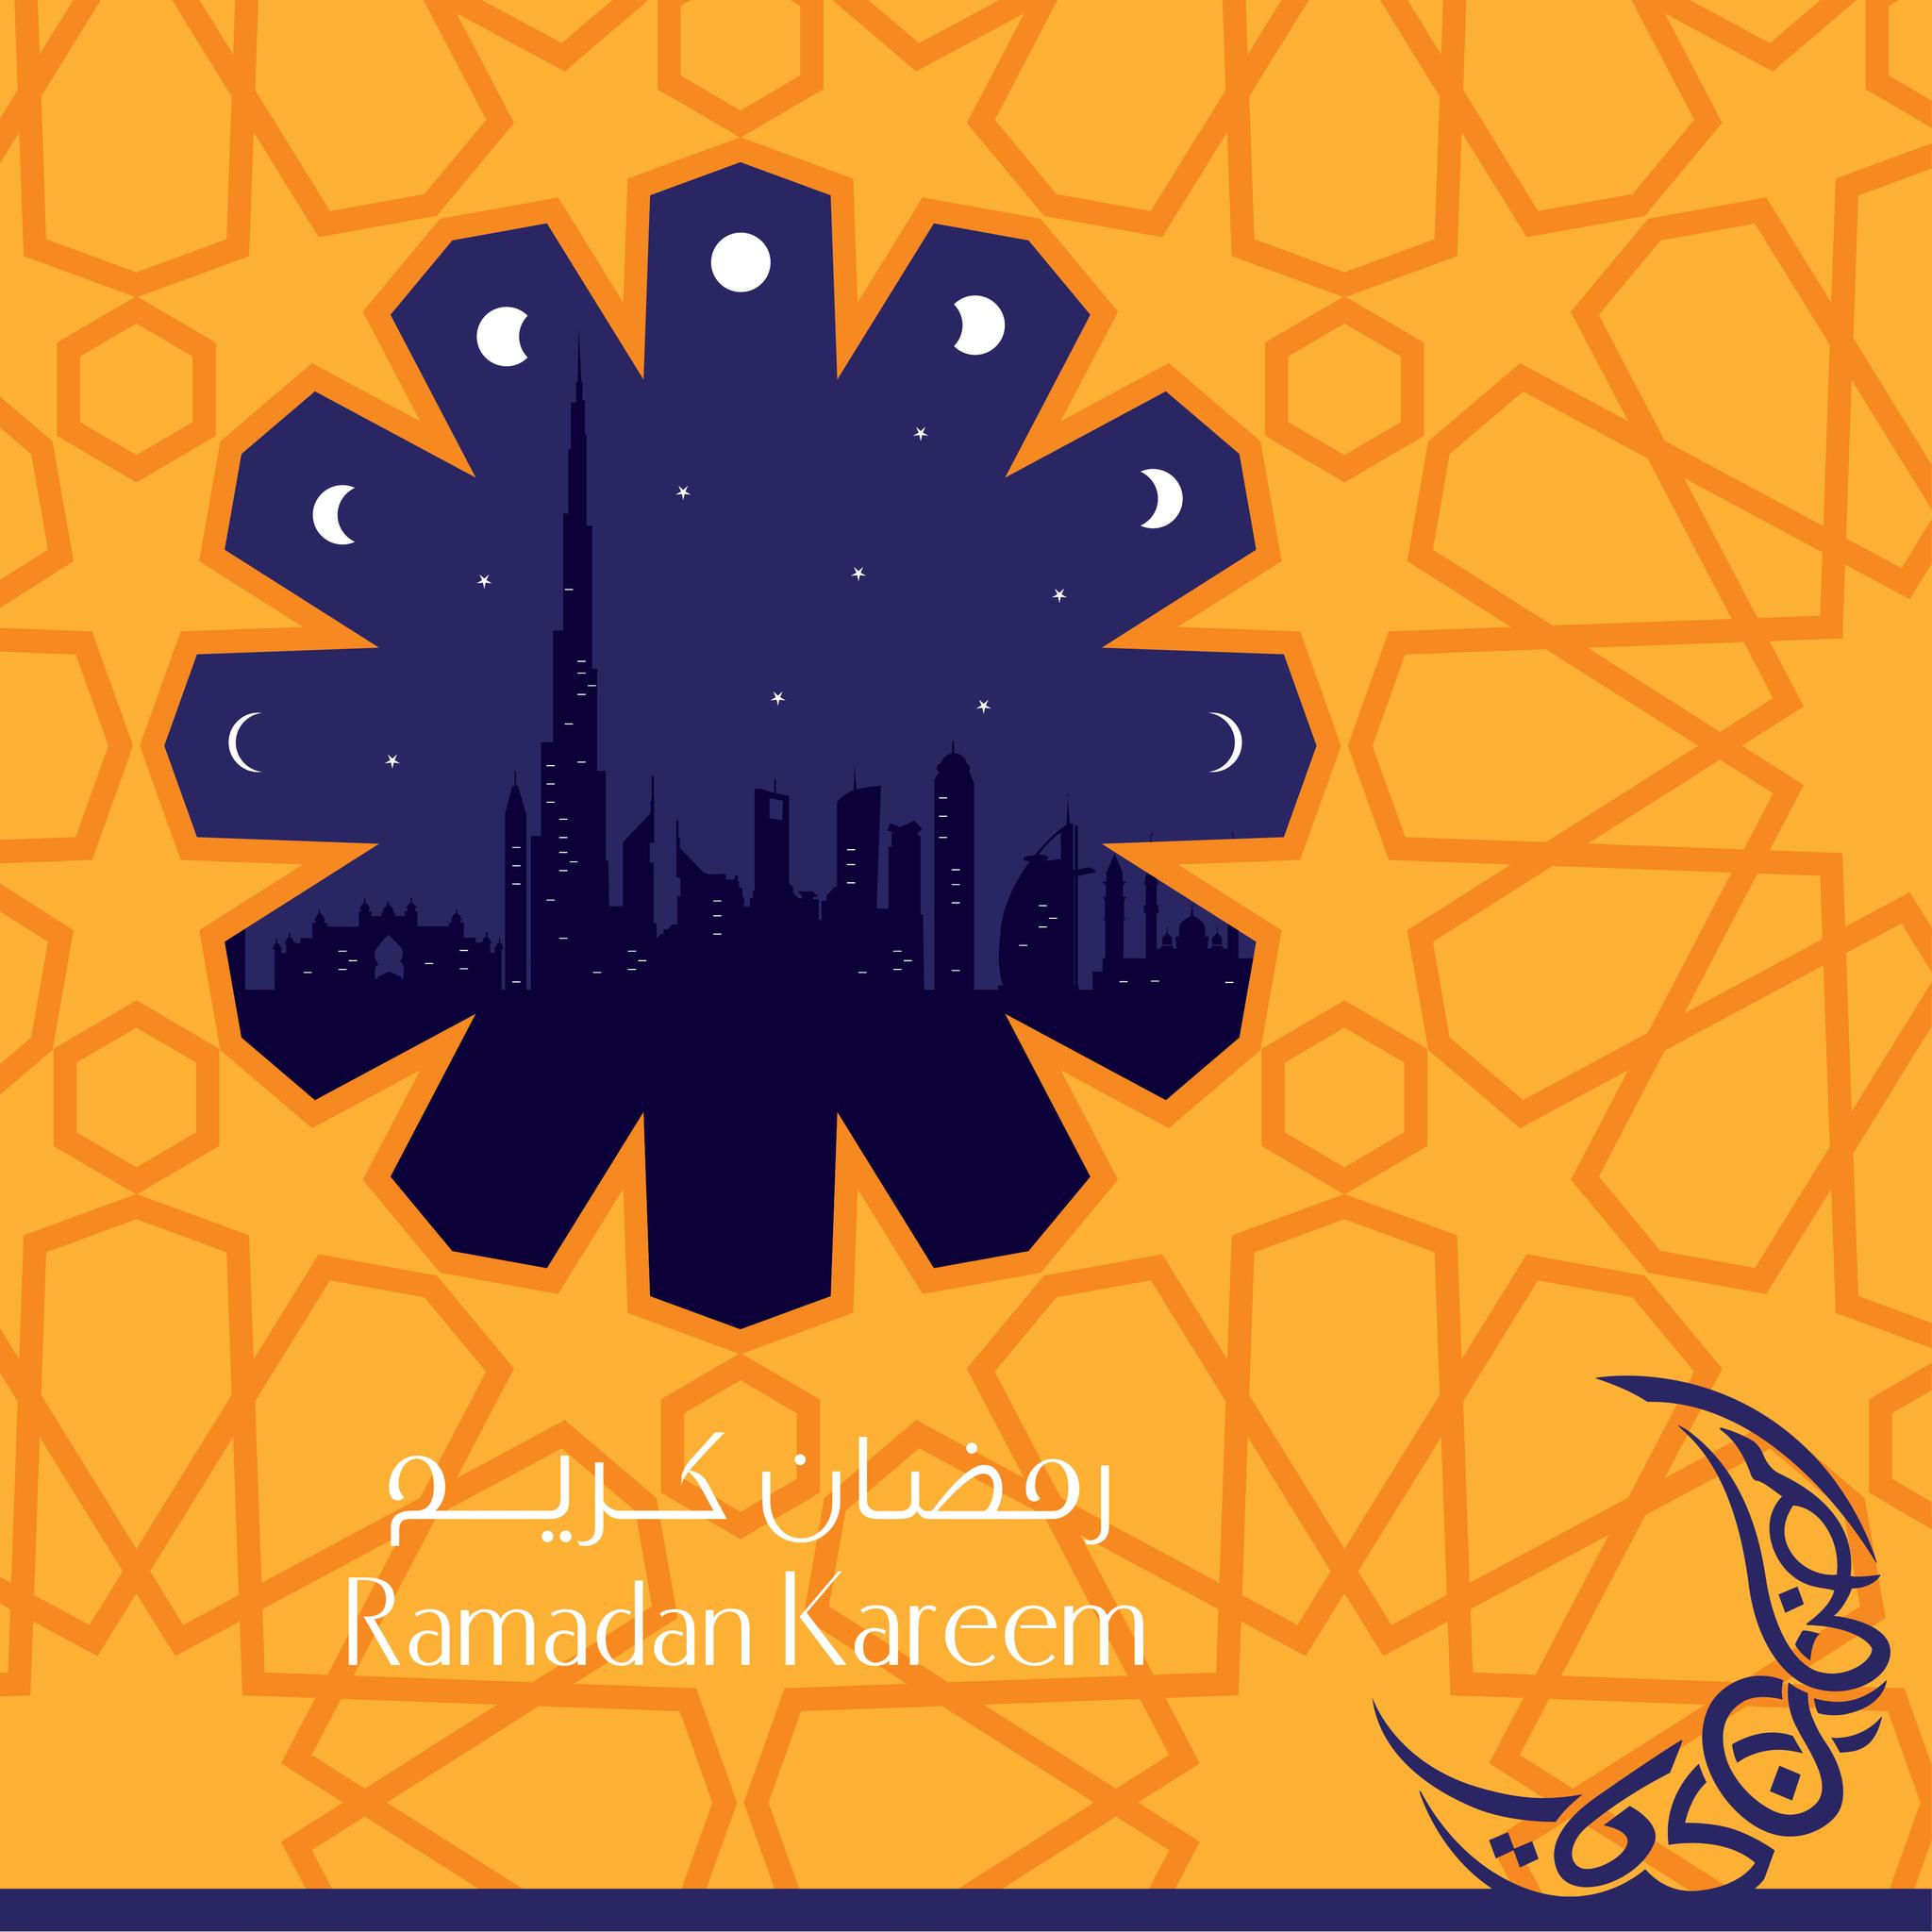 Dubai_Calendar_2017-May-26.png